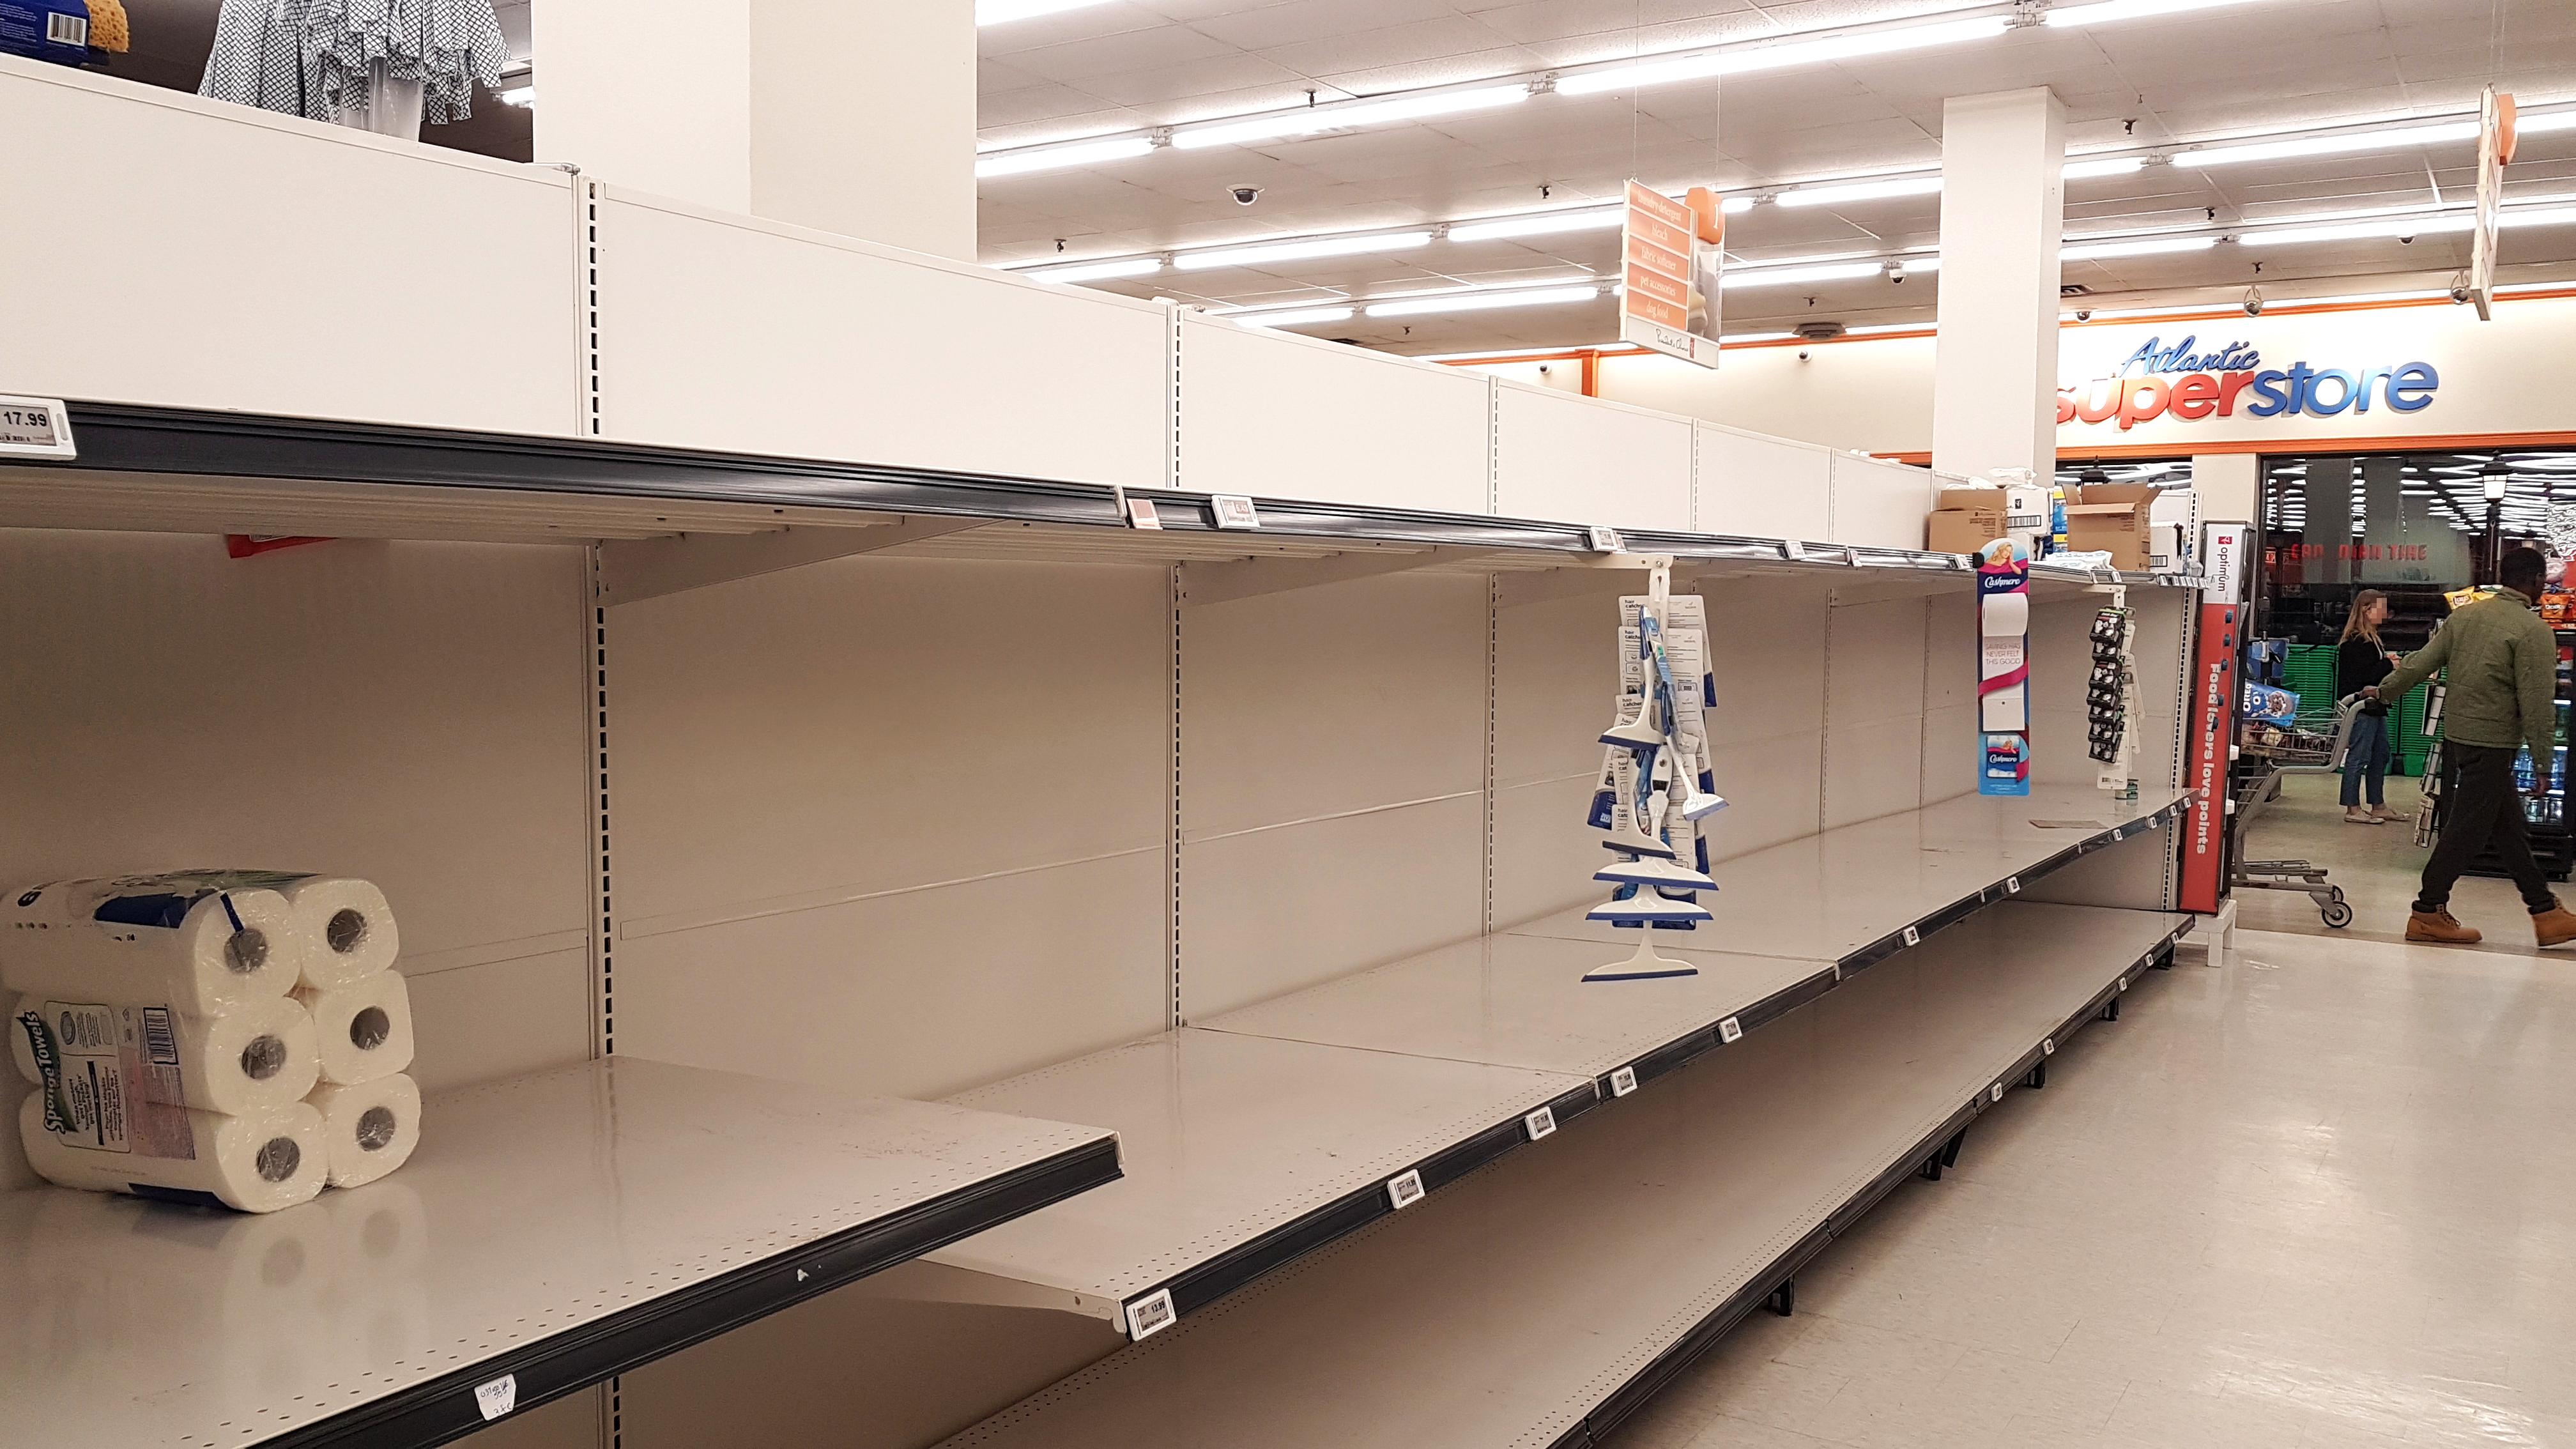 Lege supermarktrekken met nog maar 1 pak toiletpapier